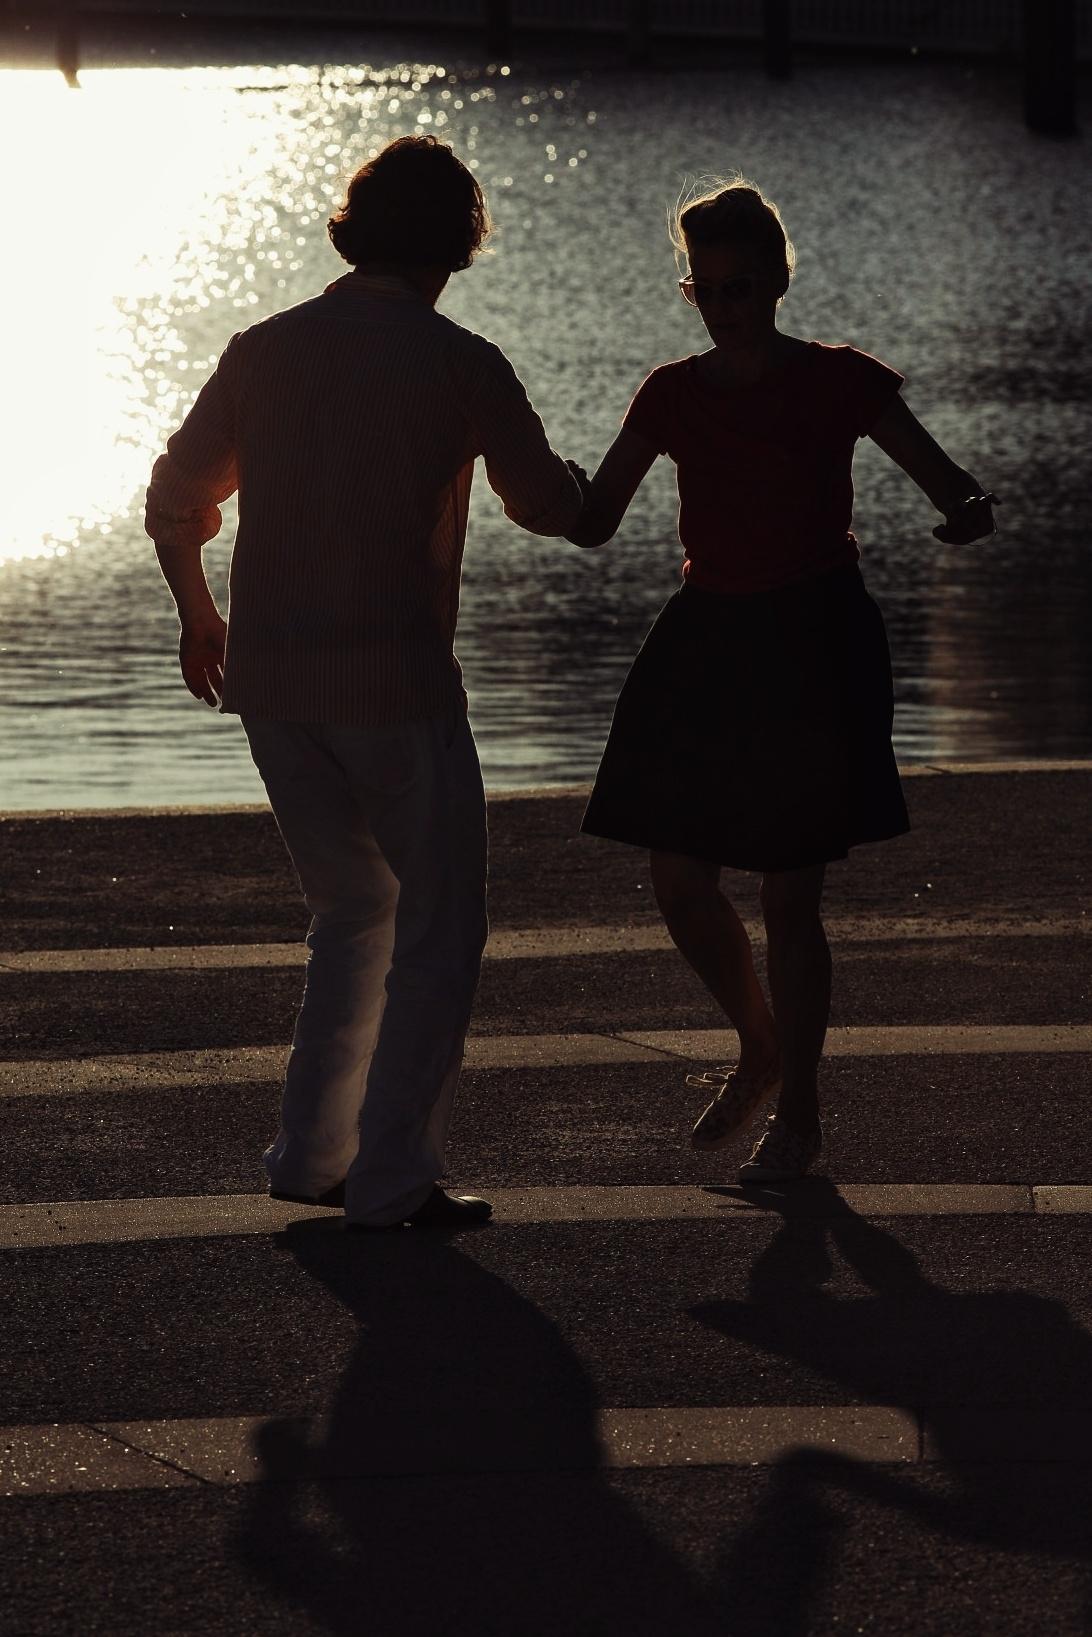 Dancing on the sun